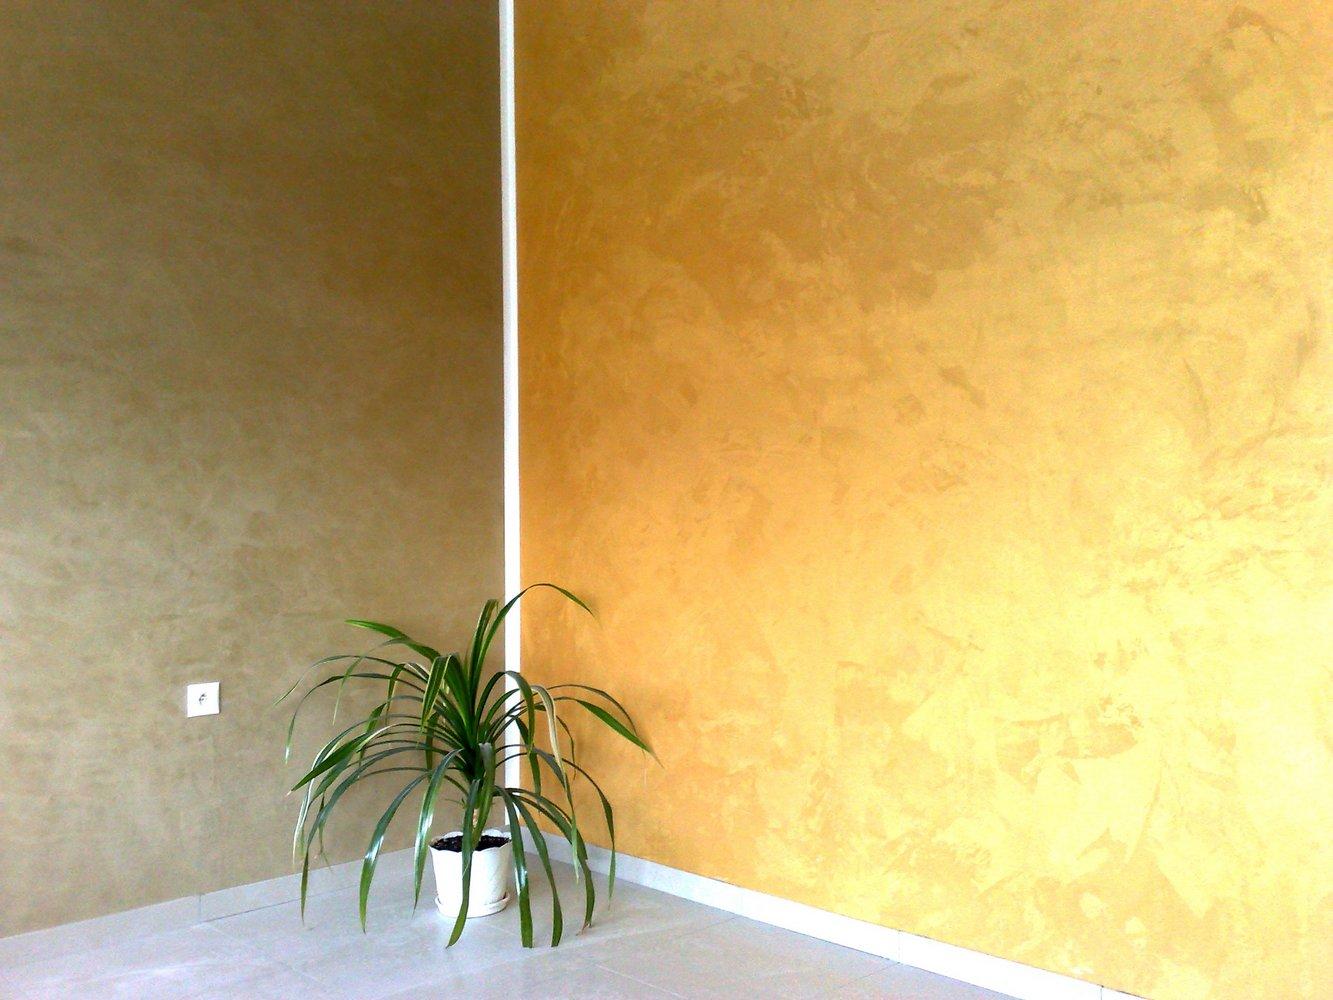 Effetti Pittura Pareti Interne.Pittura Murale Decorativa Ad Effetto Seta 39 Foto Pittura